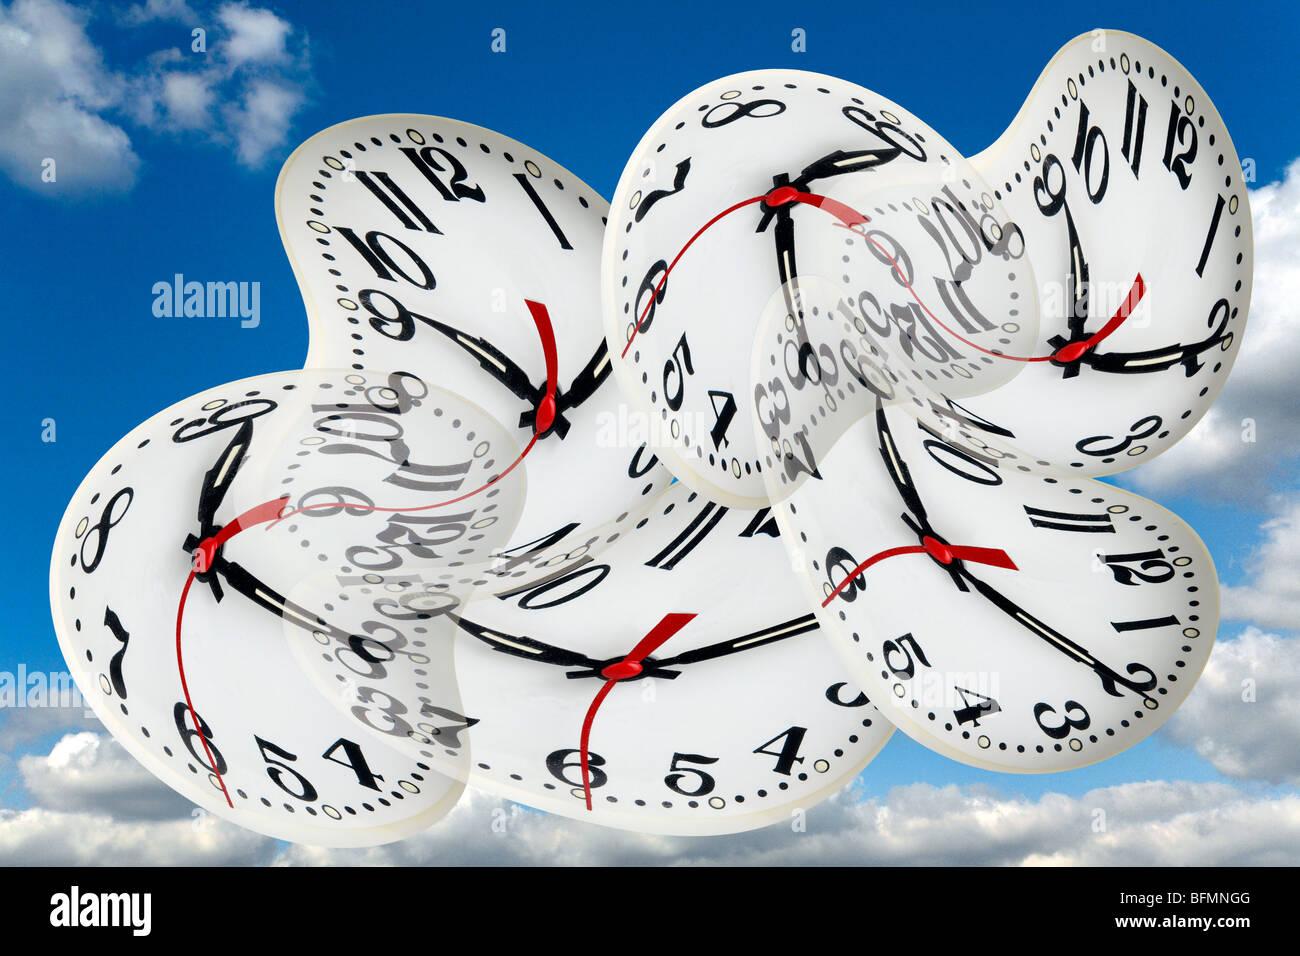 Time warps, conceptual artwork - Stock Image